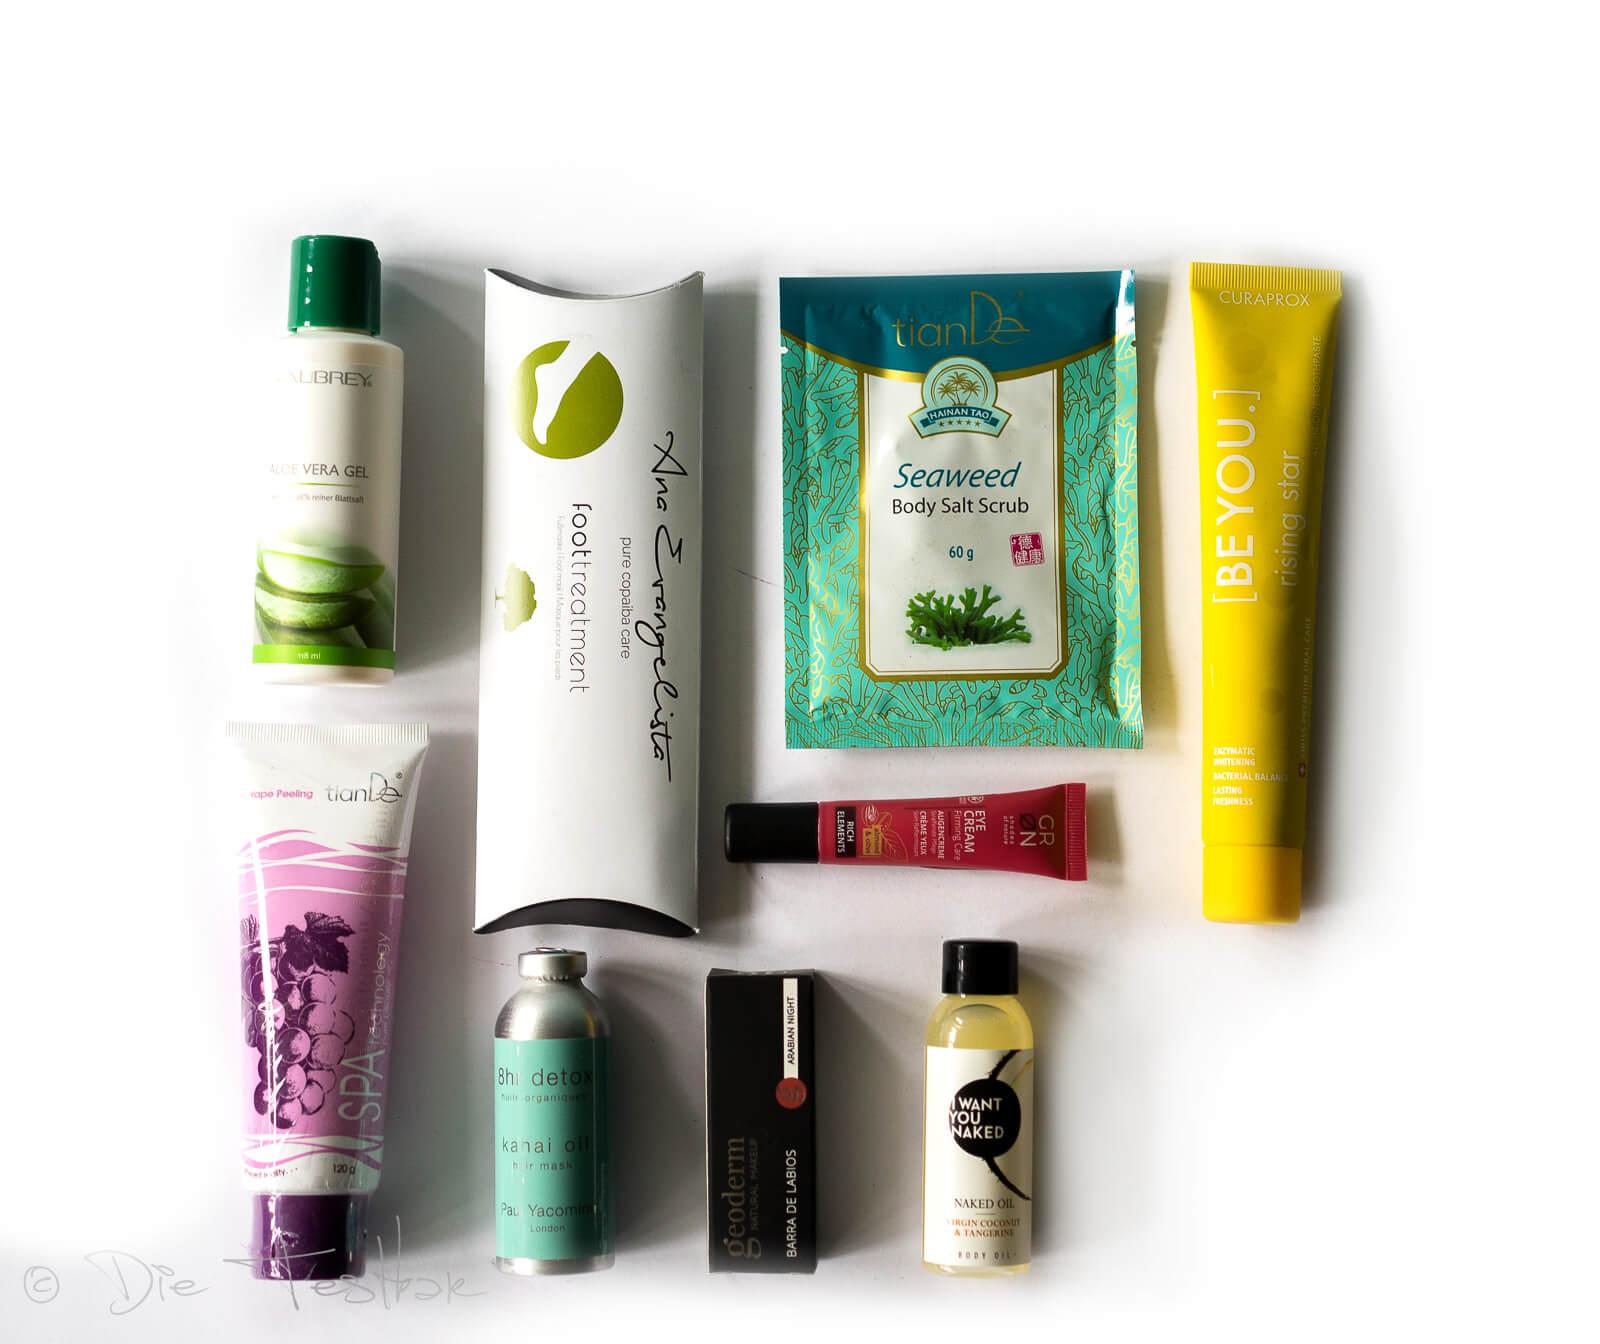 beautylove - The Natural Box im August 2020 - Powerful Rainforest